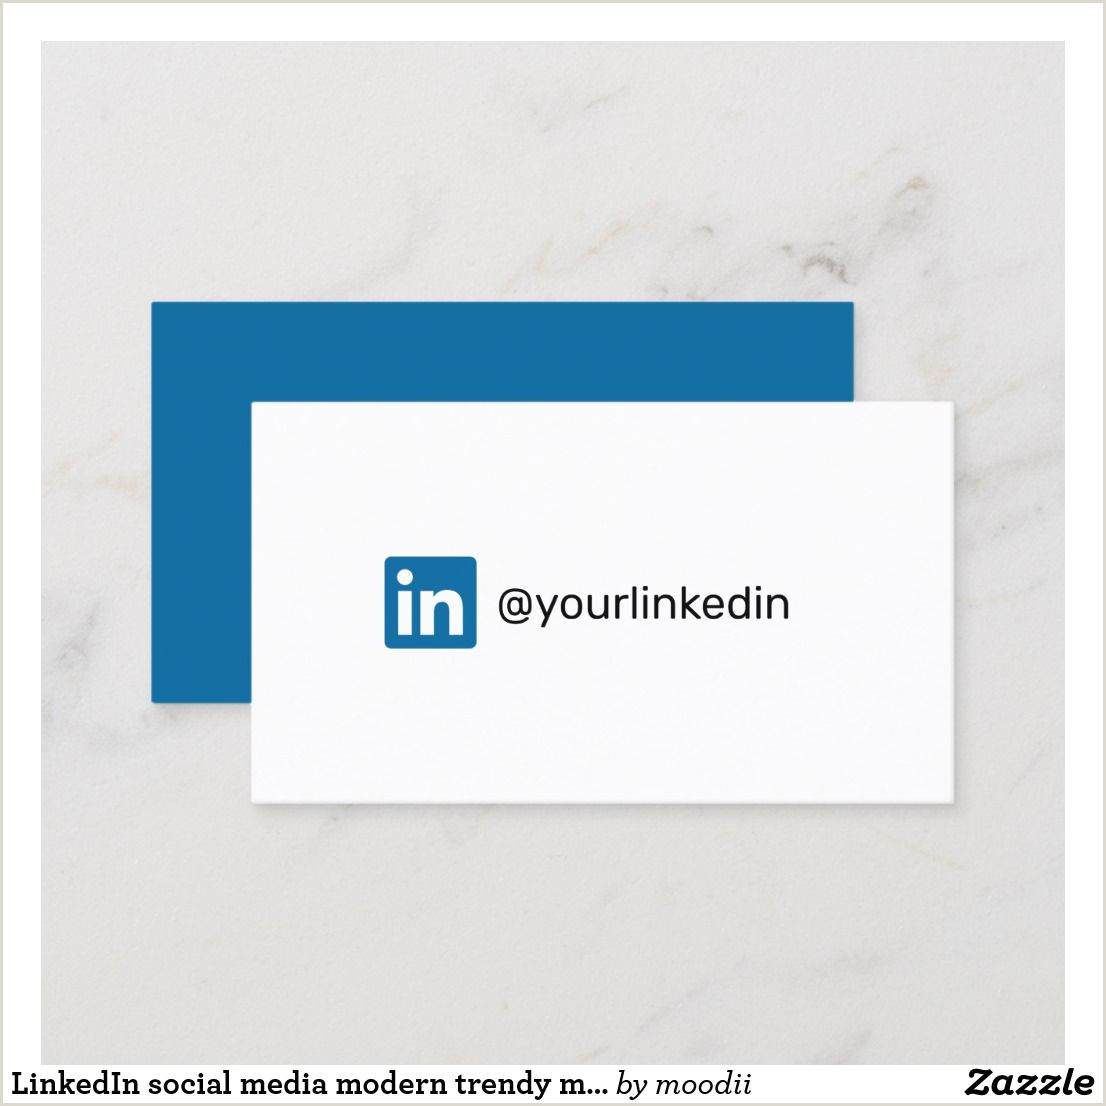 Business Cards With Social Media Linkedin Social Media Modern Trendy Marketing Calling Card